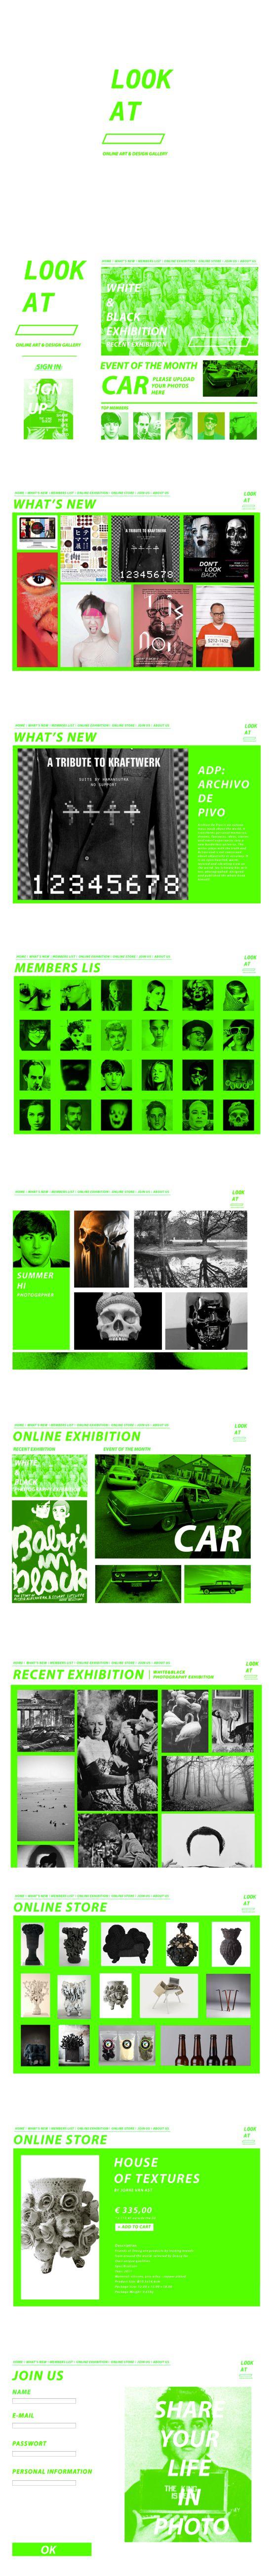 LOOK AT online art&design gallery(web design homework) on Behance